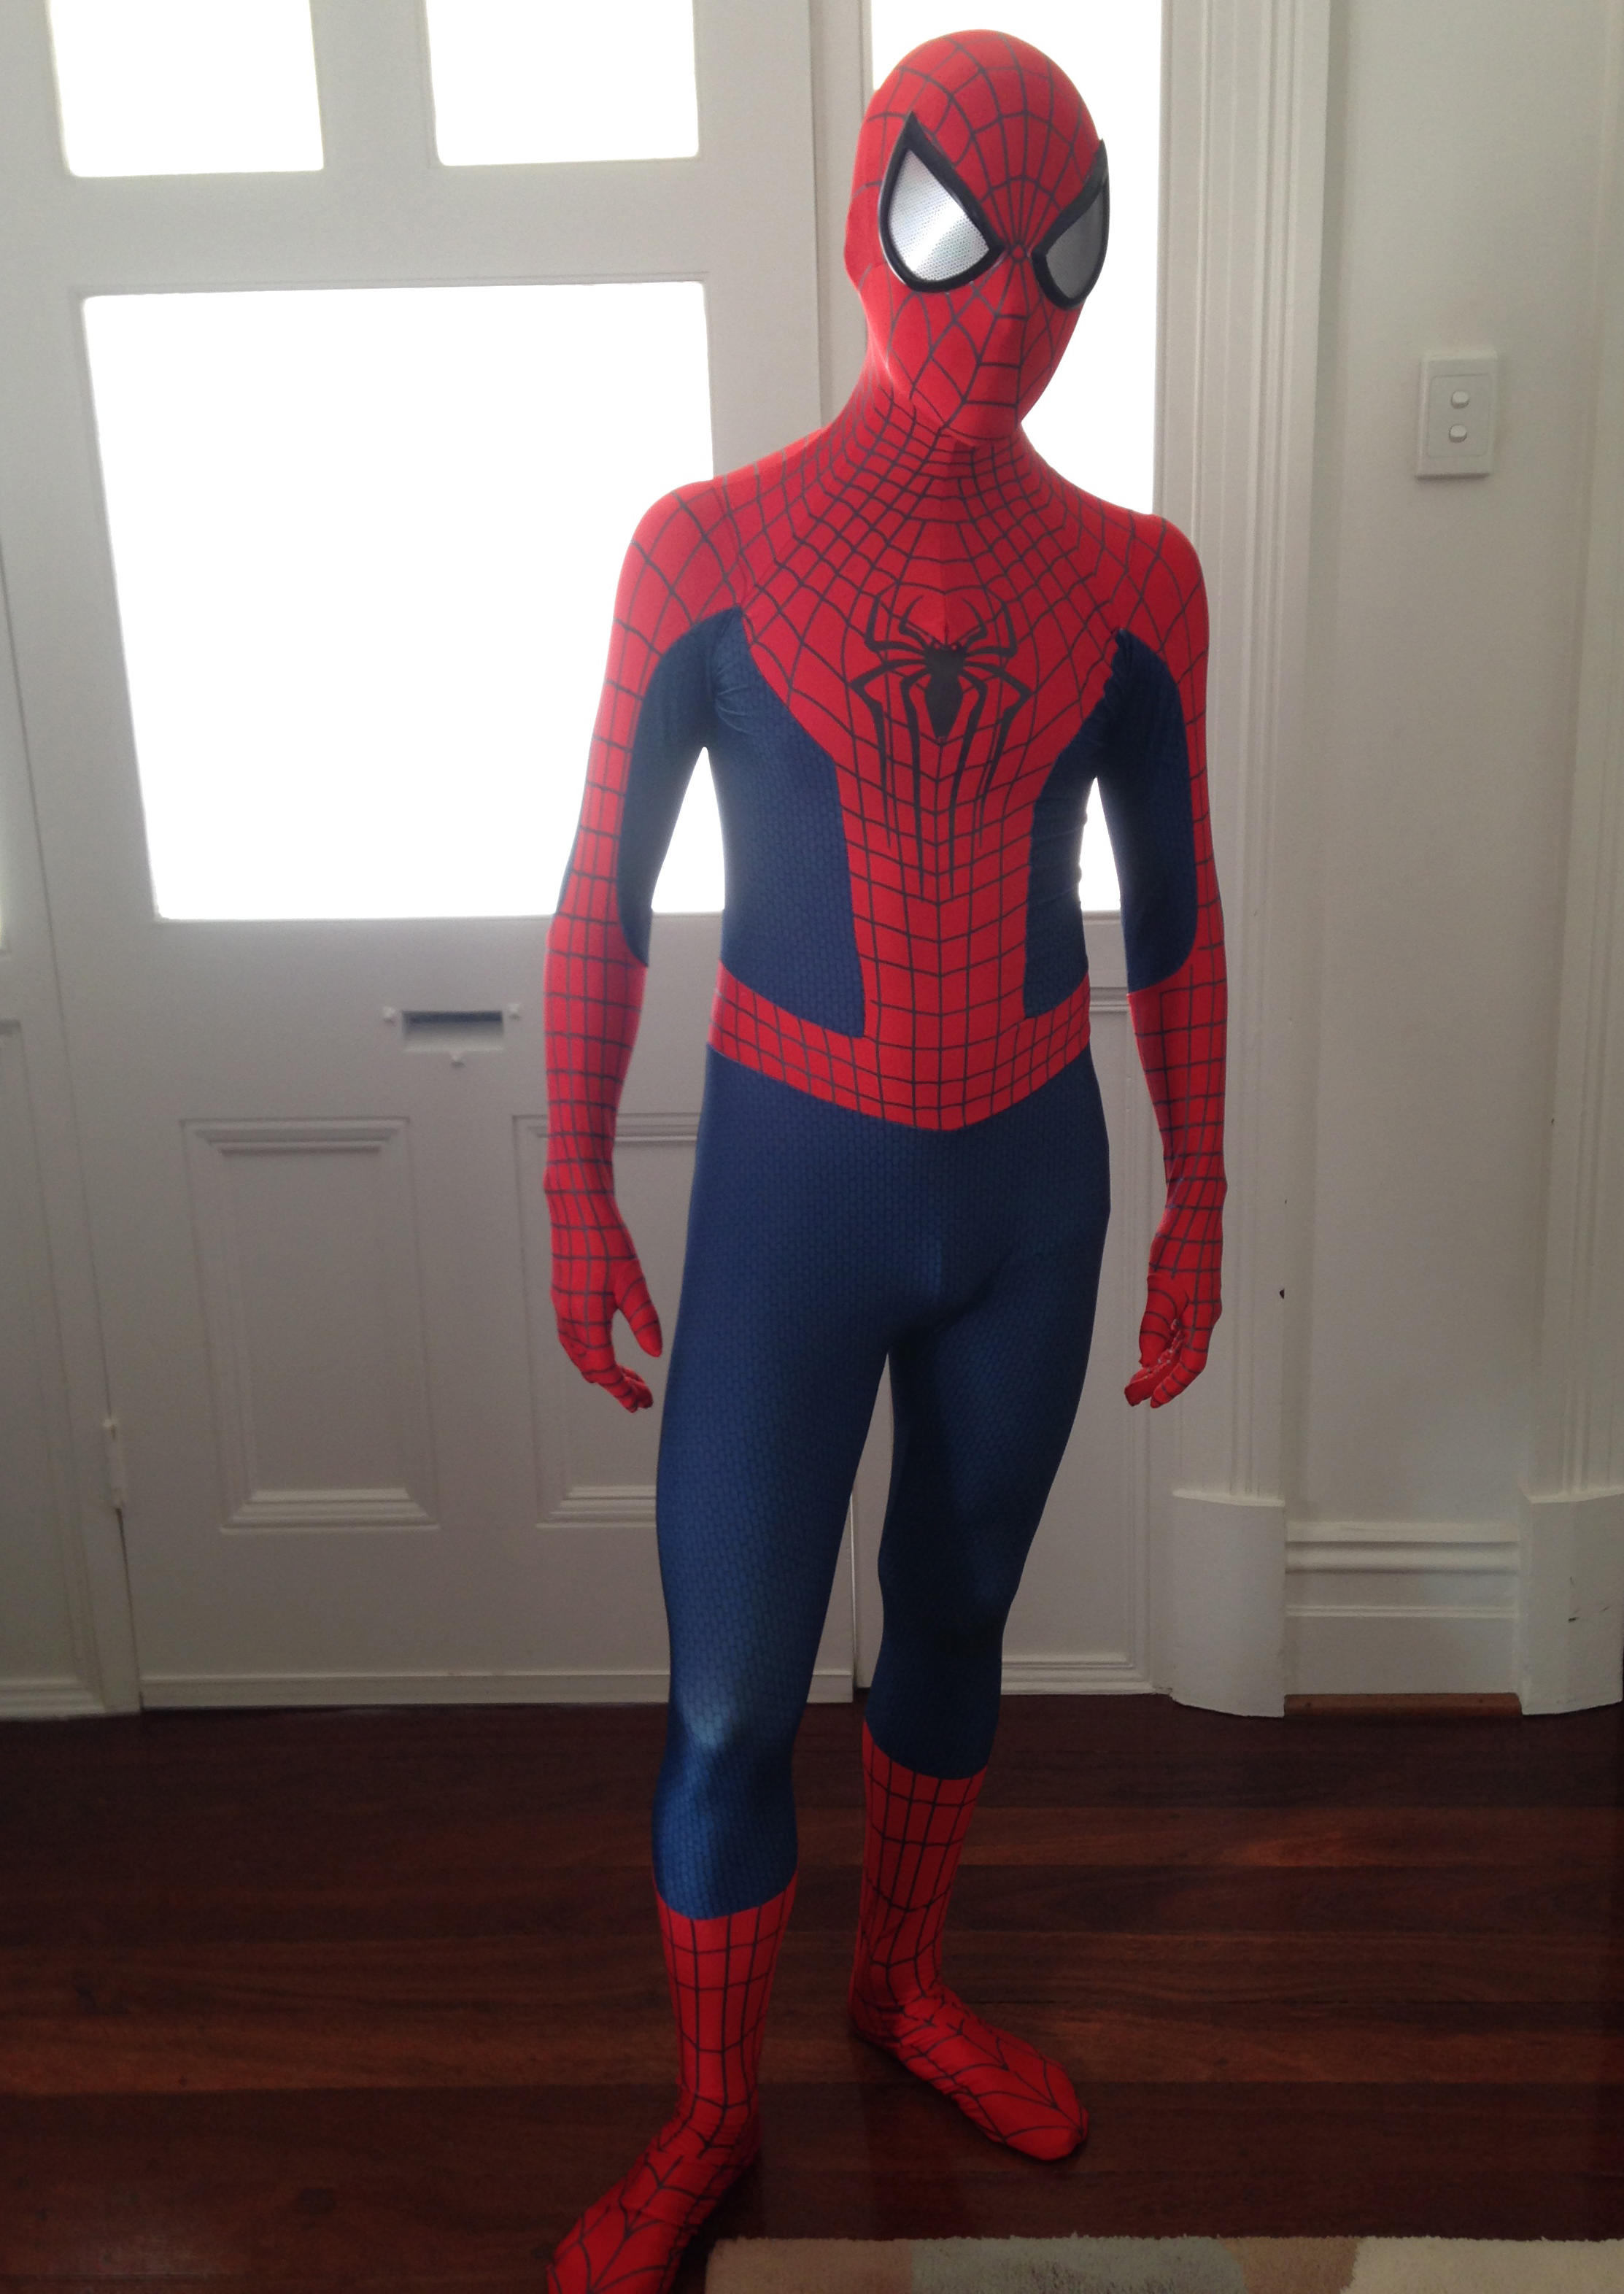 Amazing Spiderman Costumes Halloween Sexy 16081208 | cosercosplay.com